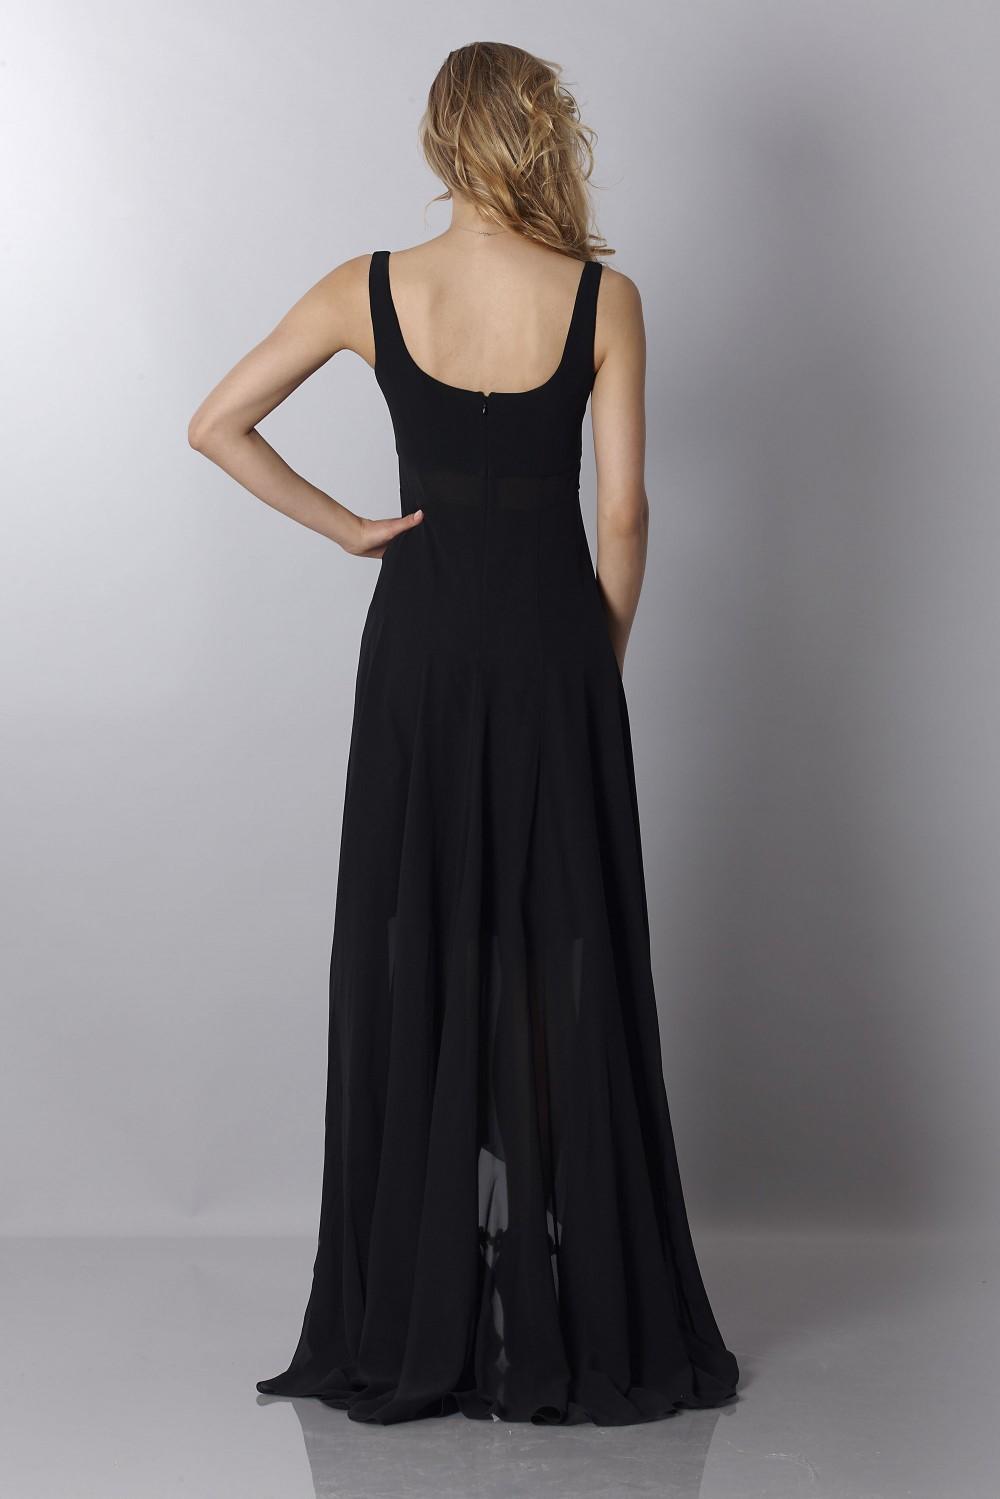 2561c40821c Drexcode - Nina Ricci Robe longue noire